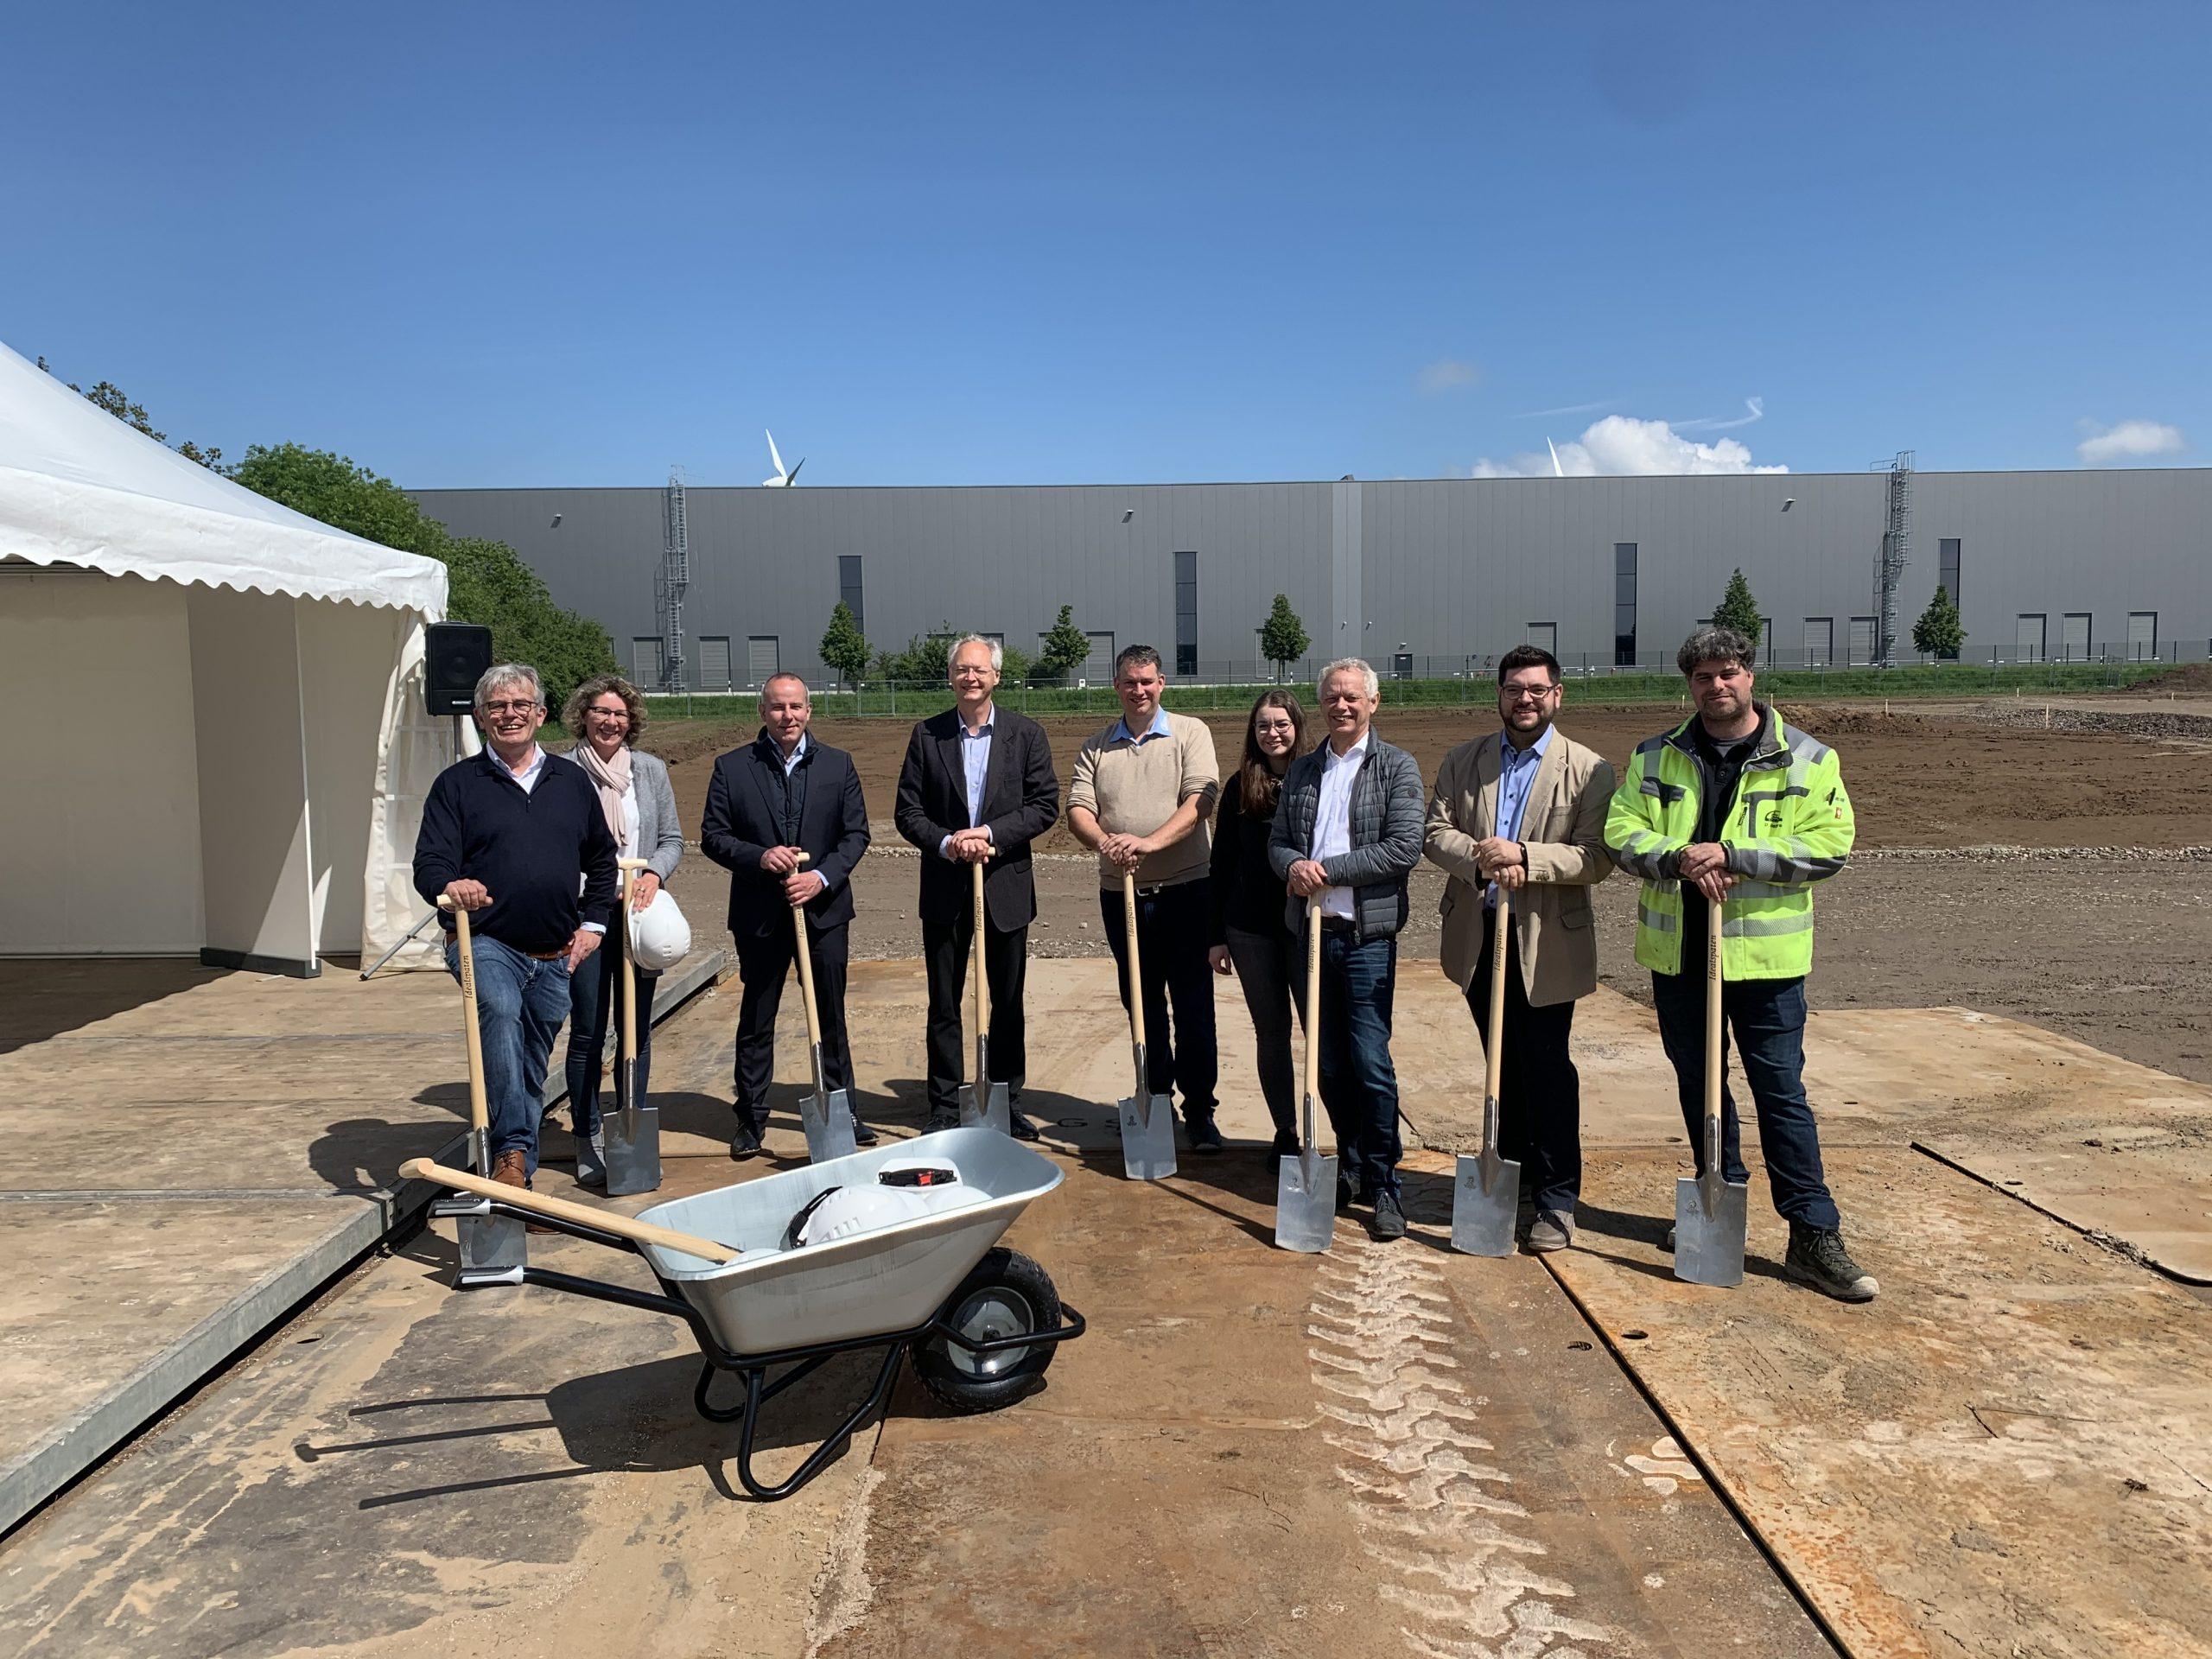 Ionisos investiert 30 Millionen Euro in Kleve